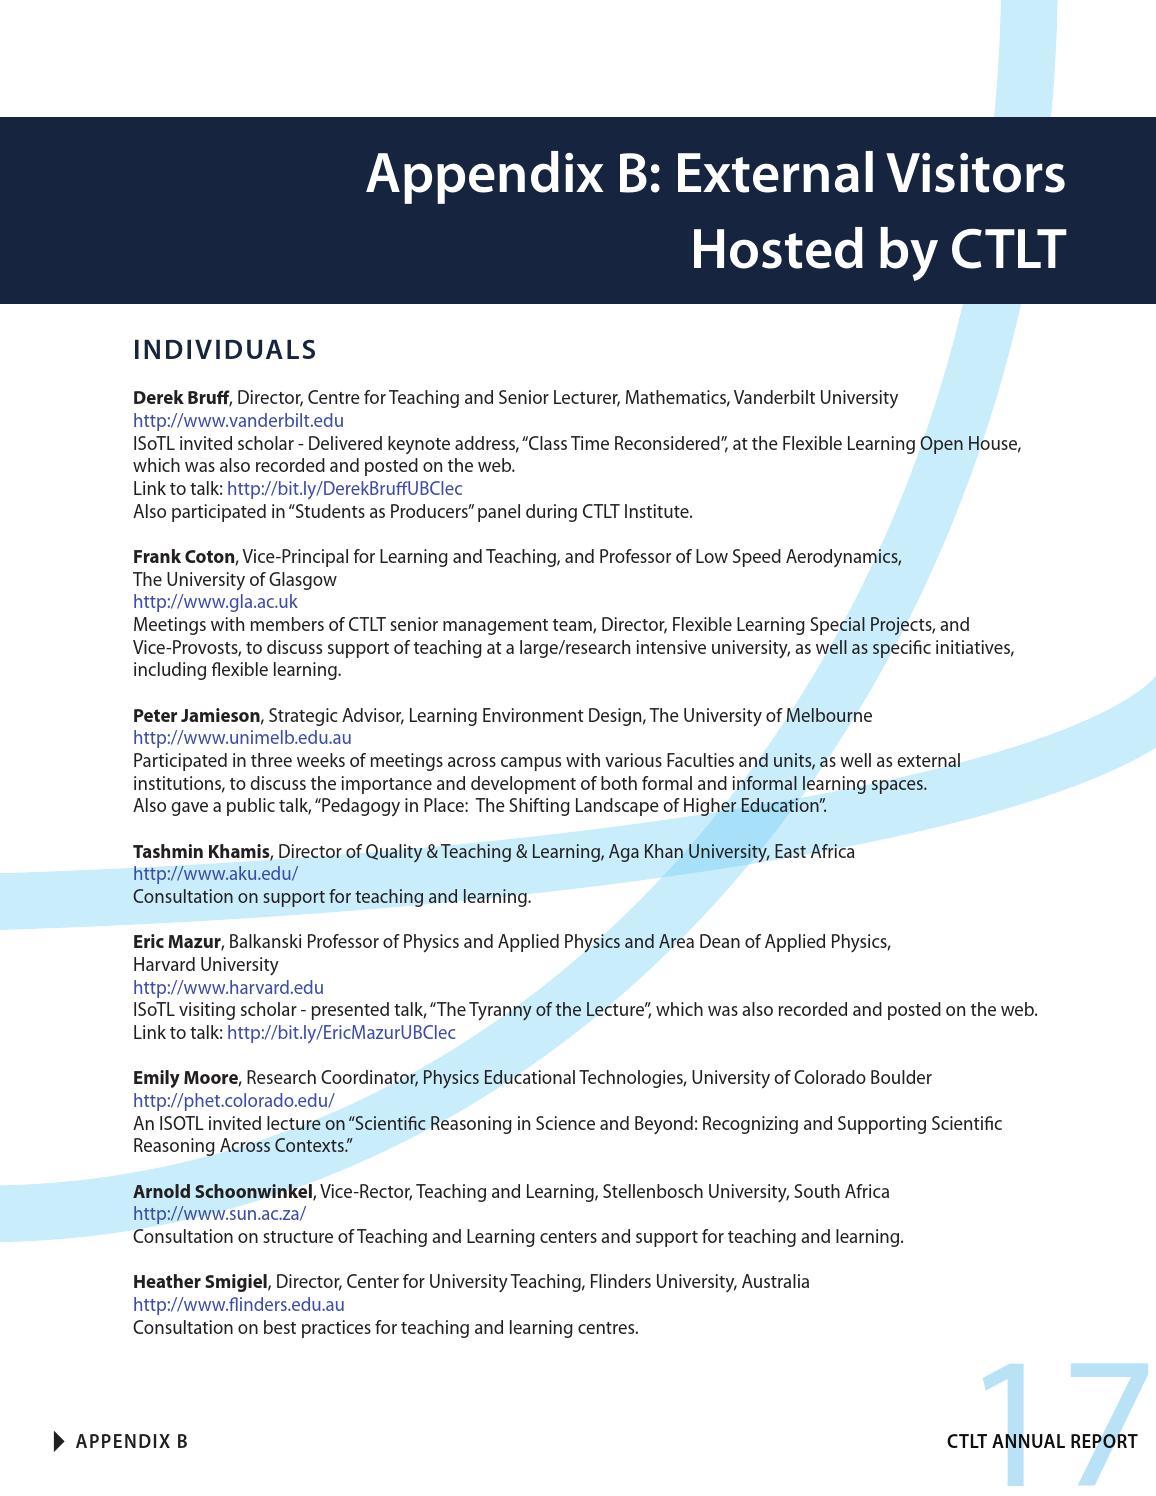 CTLT Annual Report 2014